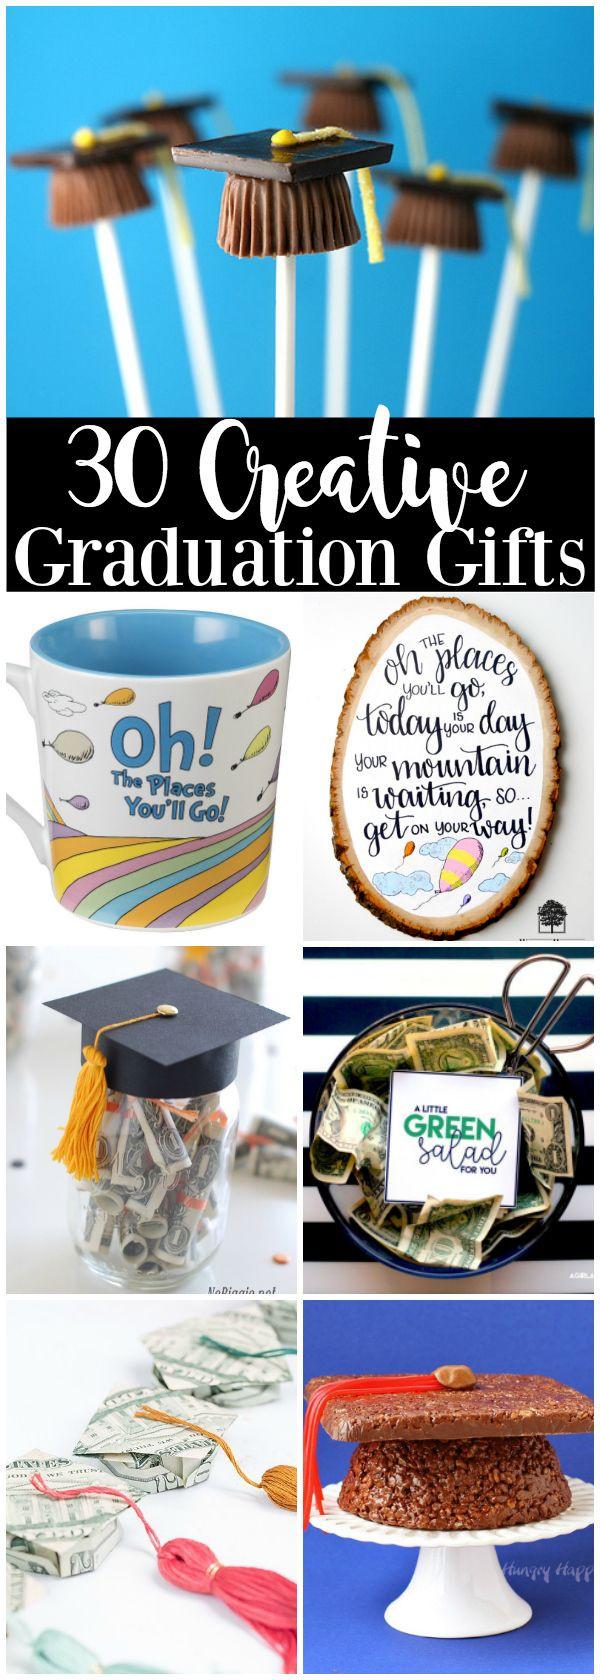 Graduation Gift Ideas For Sister  30 Creative Graduation Gift Ideas